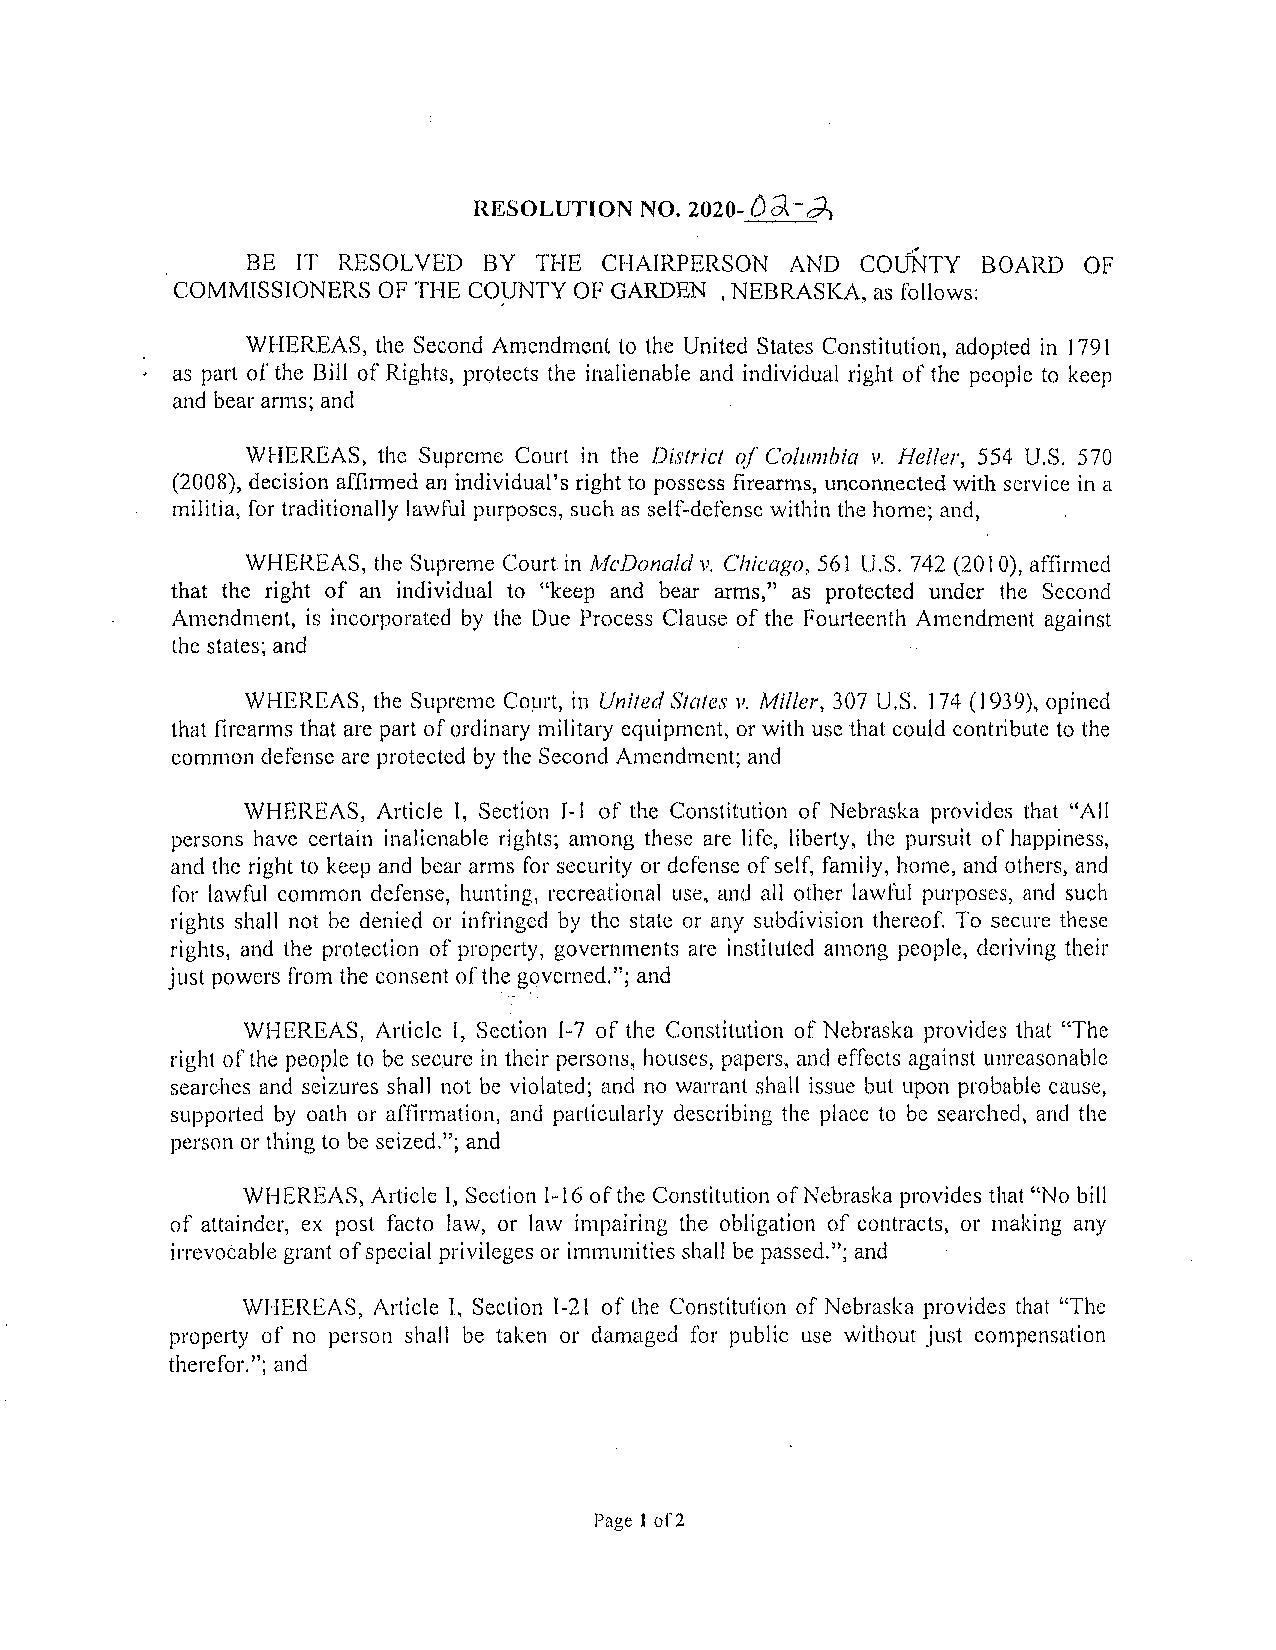 Garden County Nebraska Resolution page 1